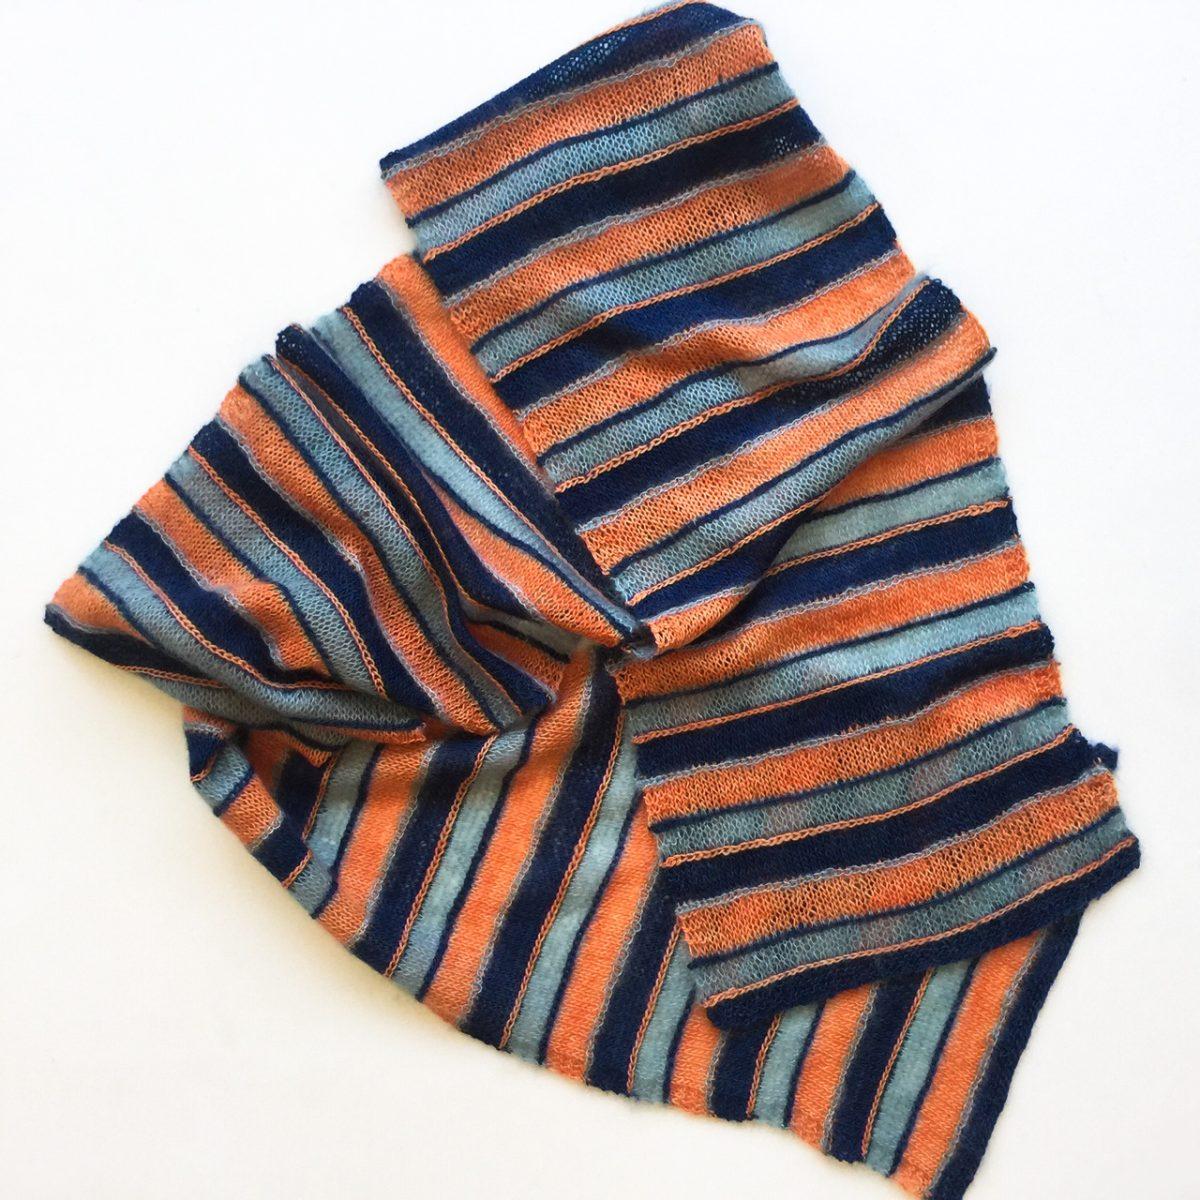 Knit stripes by Cowgirlblues